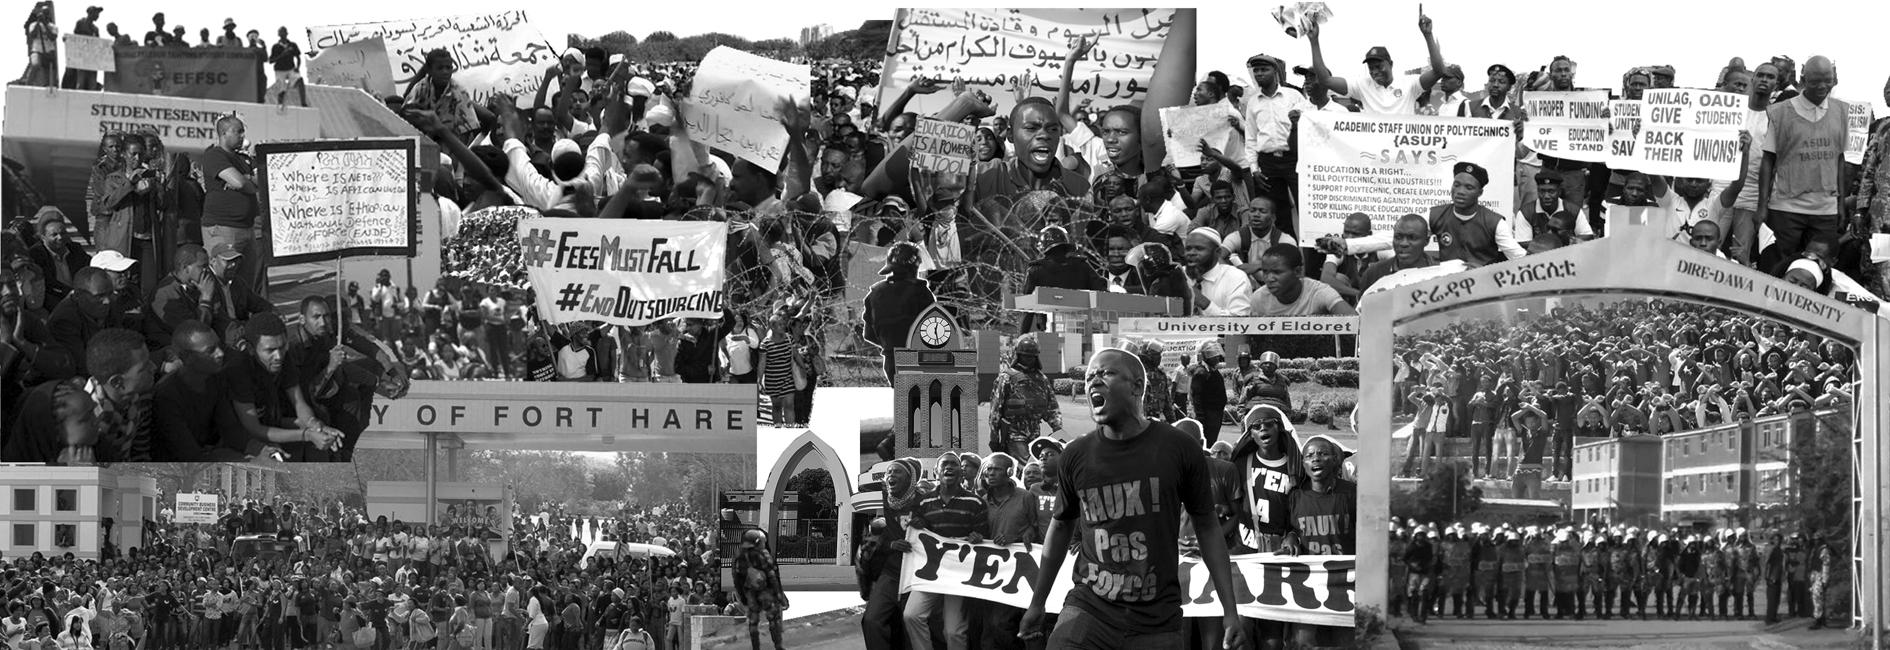 Reform and Revolution: Destruction of the University